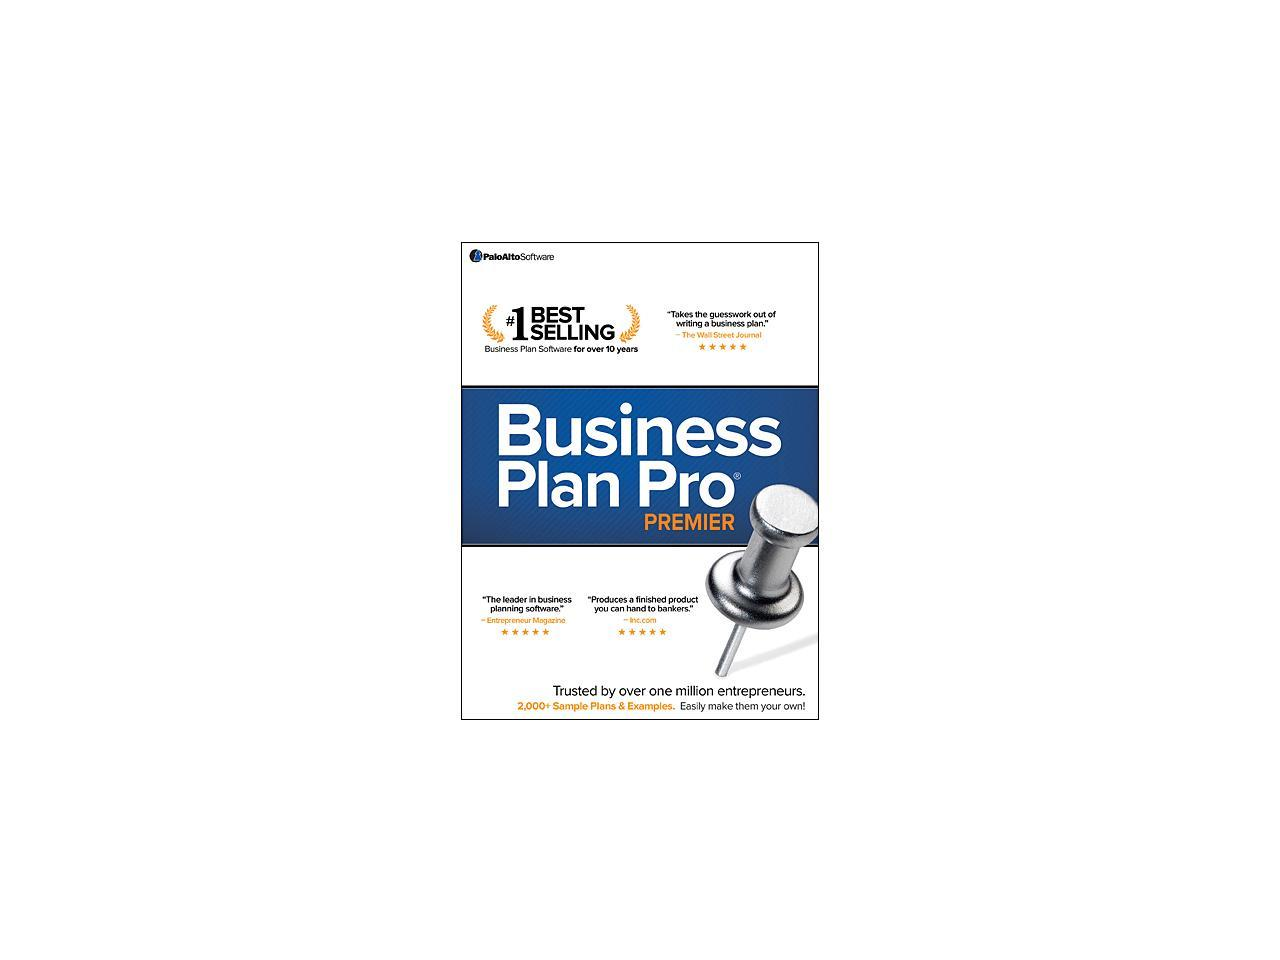 Paloalto business plan pro download socrates no evil can happen essay